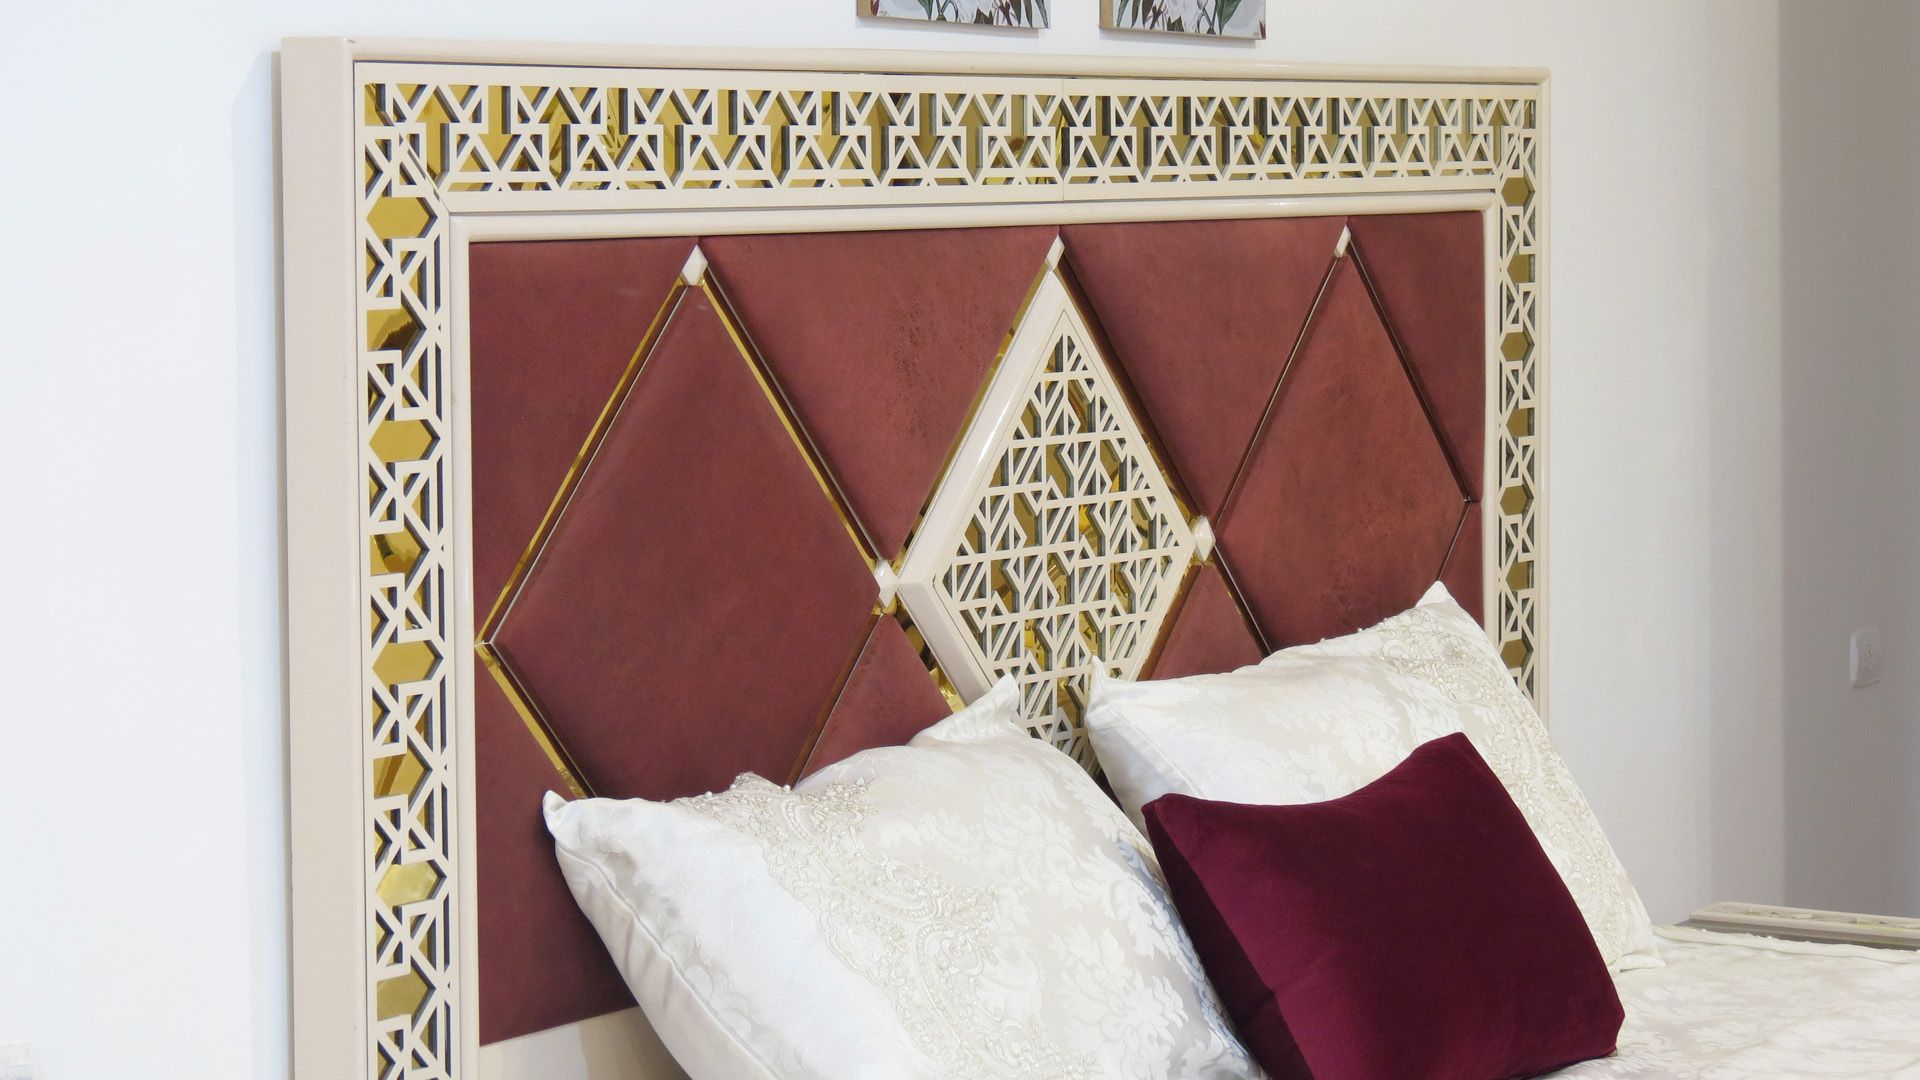 غرف نوم مودرن 2021 كاملة تركي